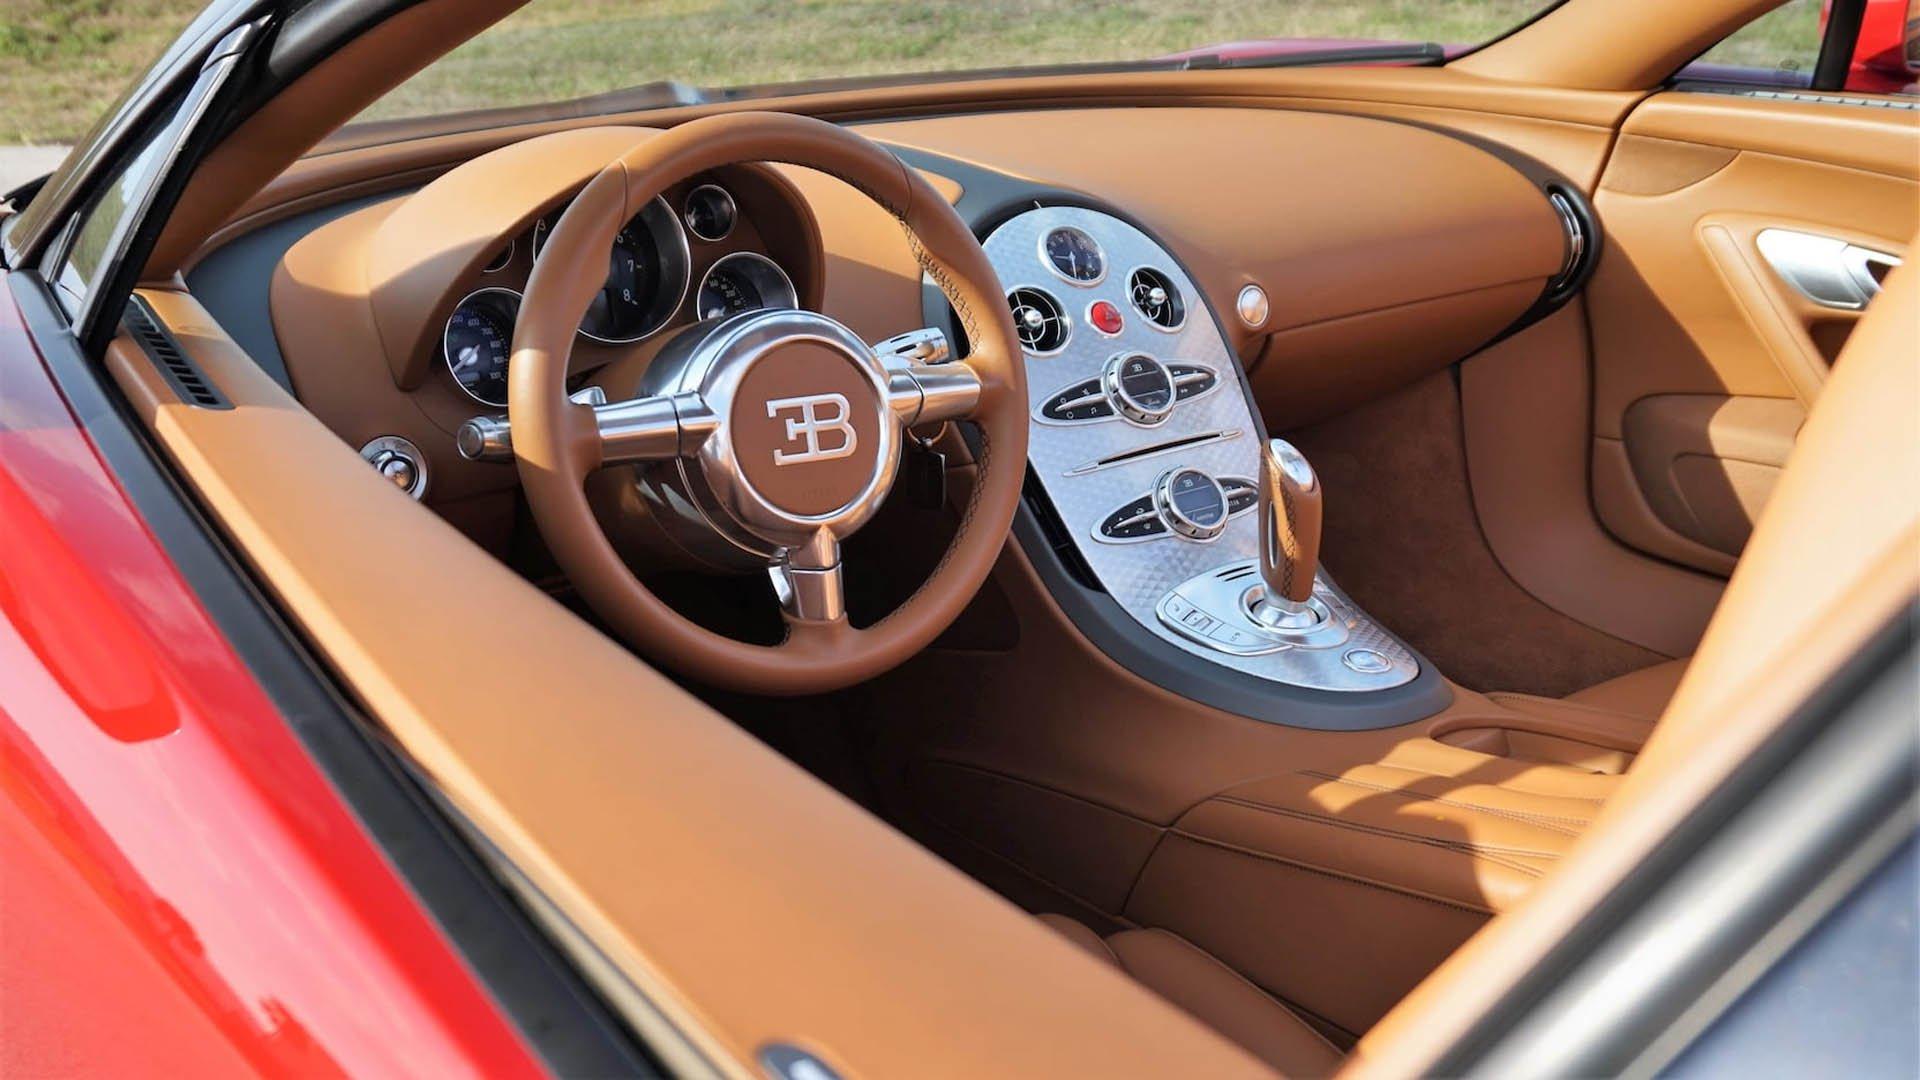 bugatti-veyron-thay-the-linh-kien-3.jpg